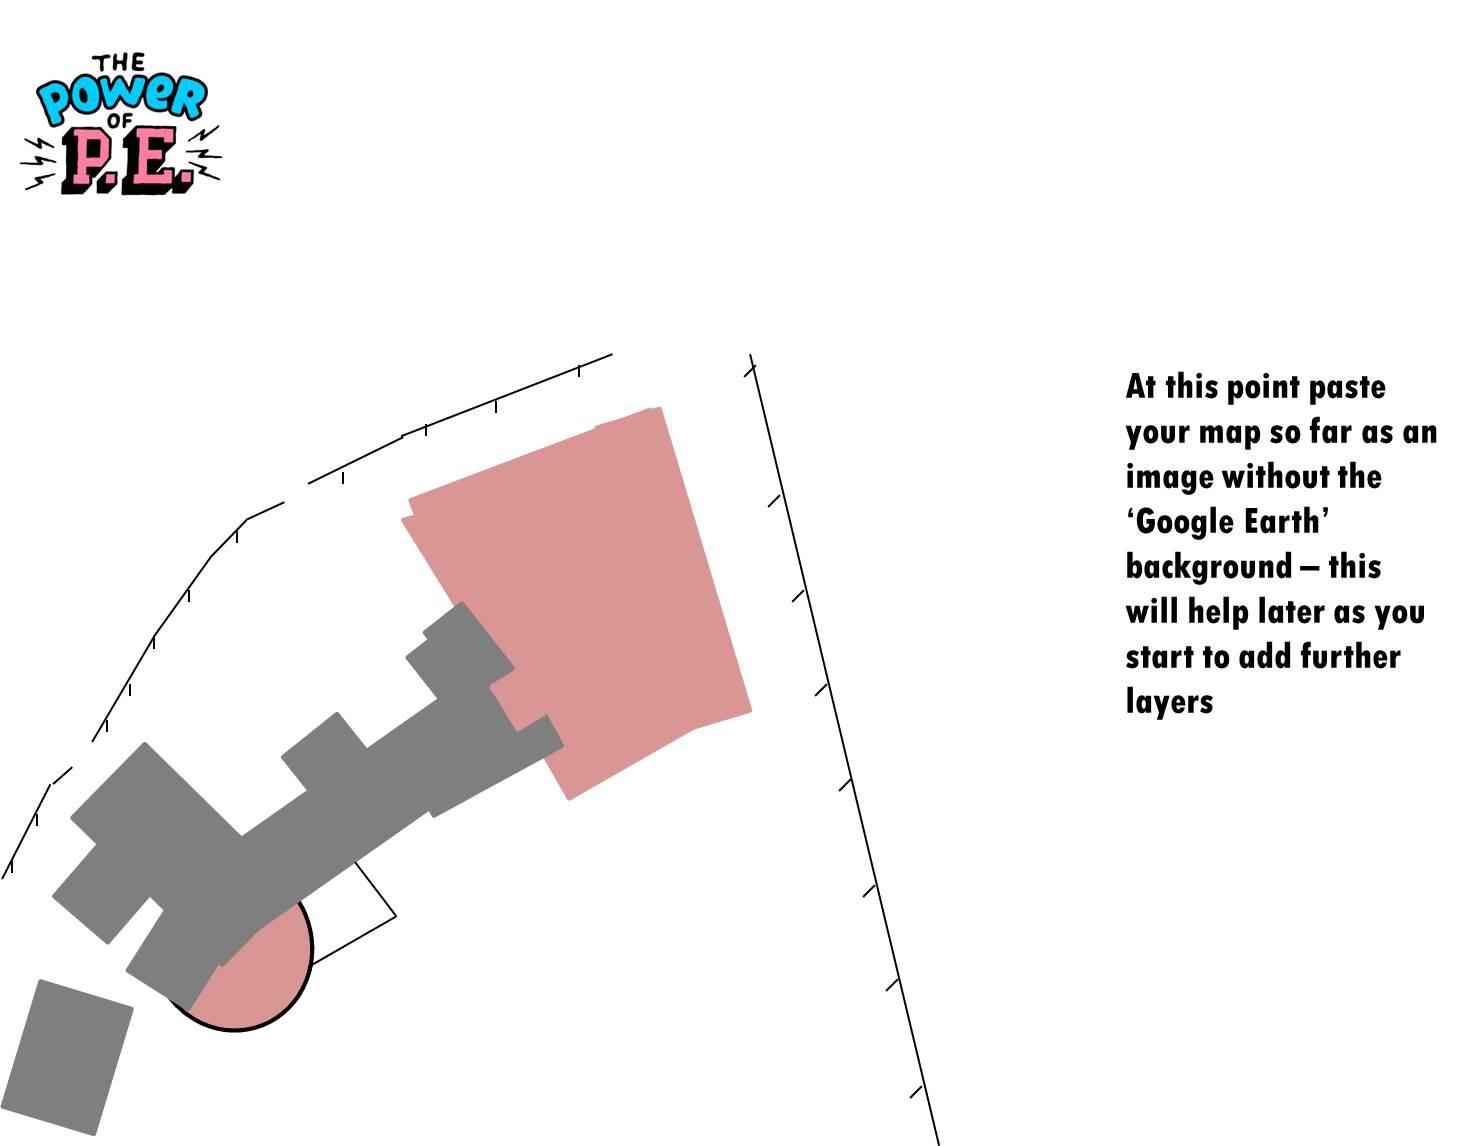 Orienteering 6 Power of P.E